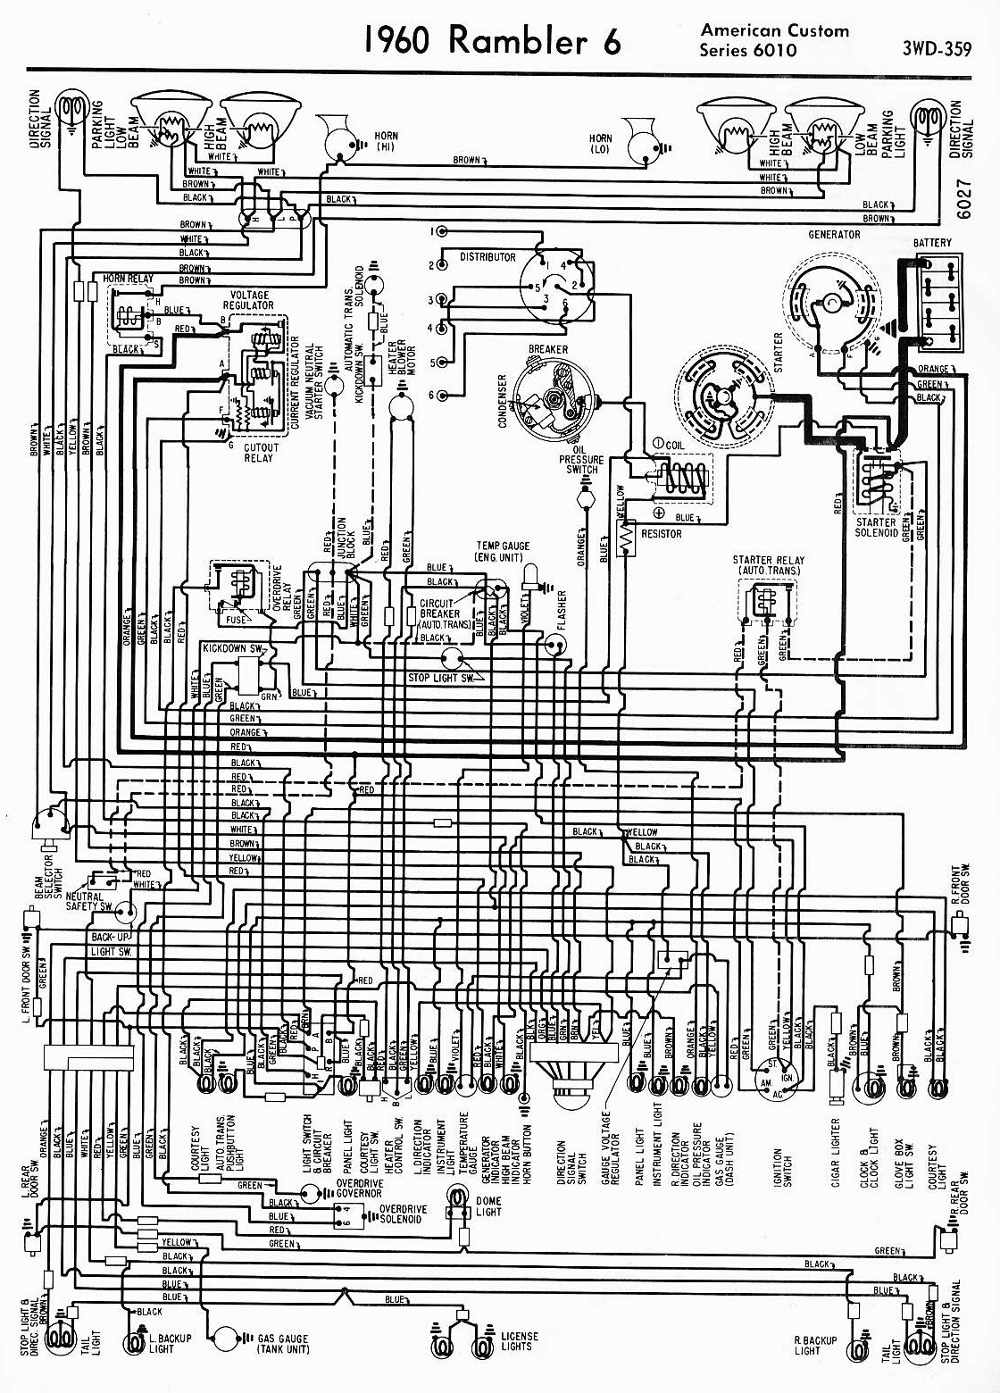 amc car manuals wiring diagrams pdf fault codes rh automotive manuals net AMC Hornet AMC Rambler Cars Sale